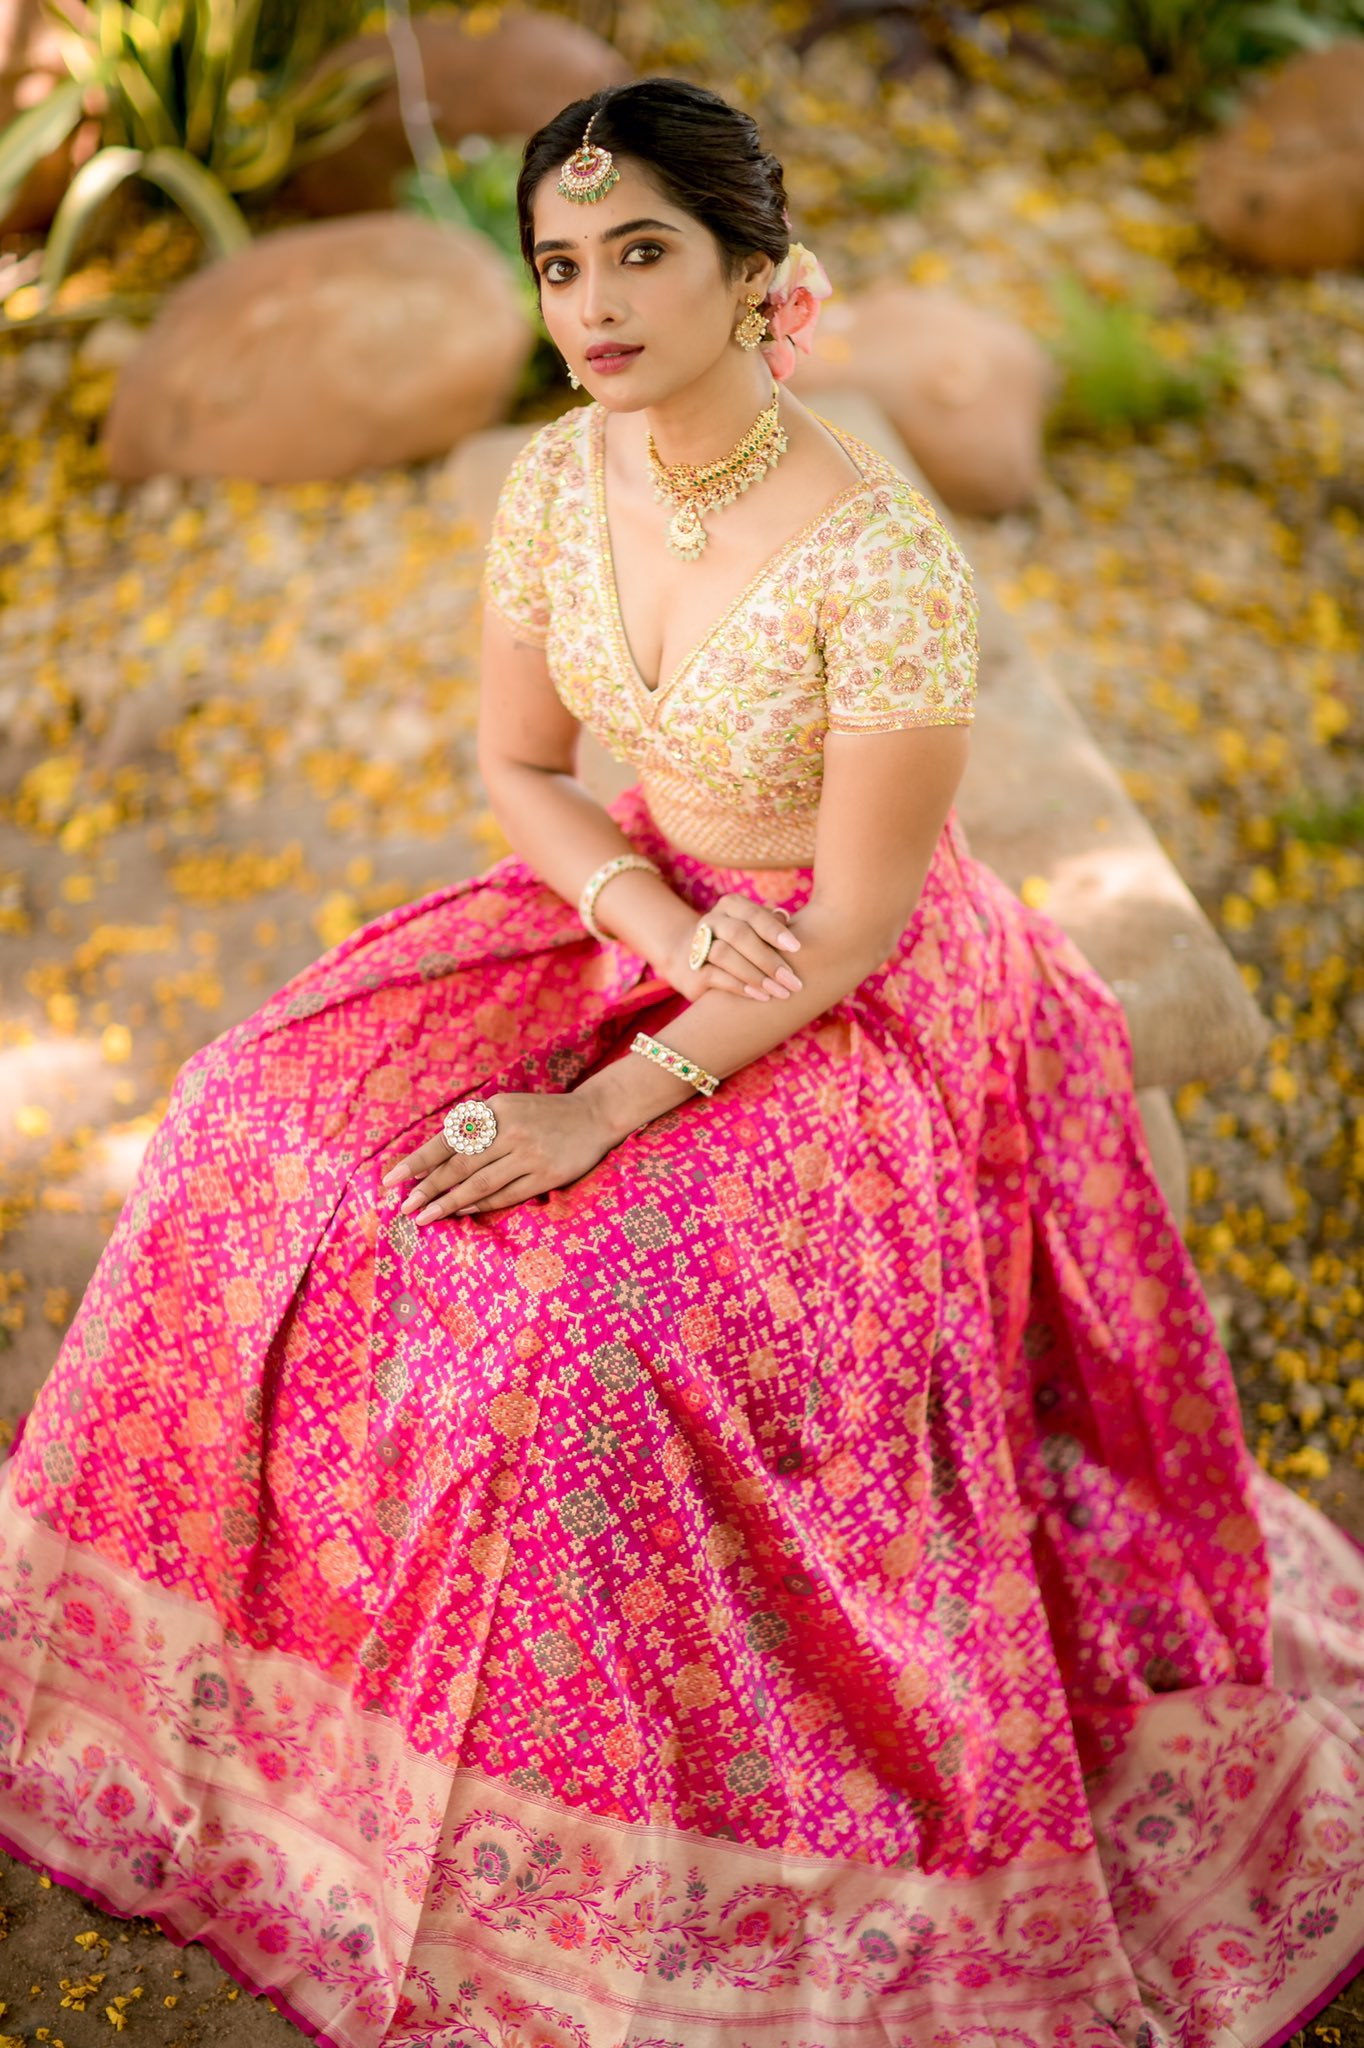 Masoom Shankar Photos hd (43)